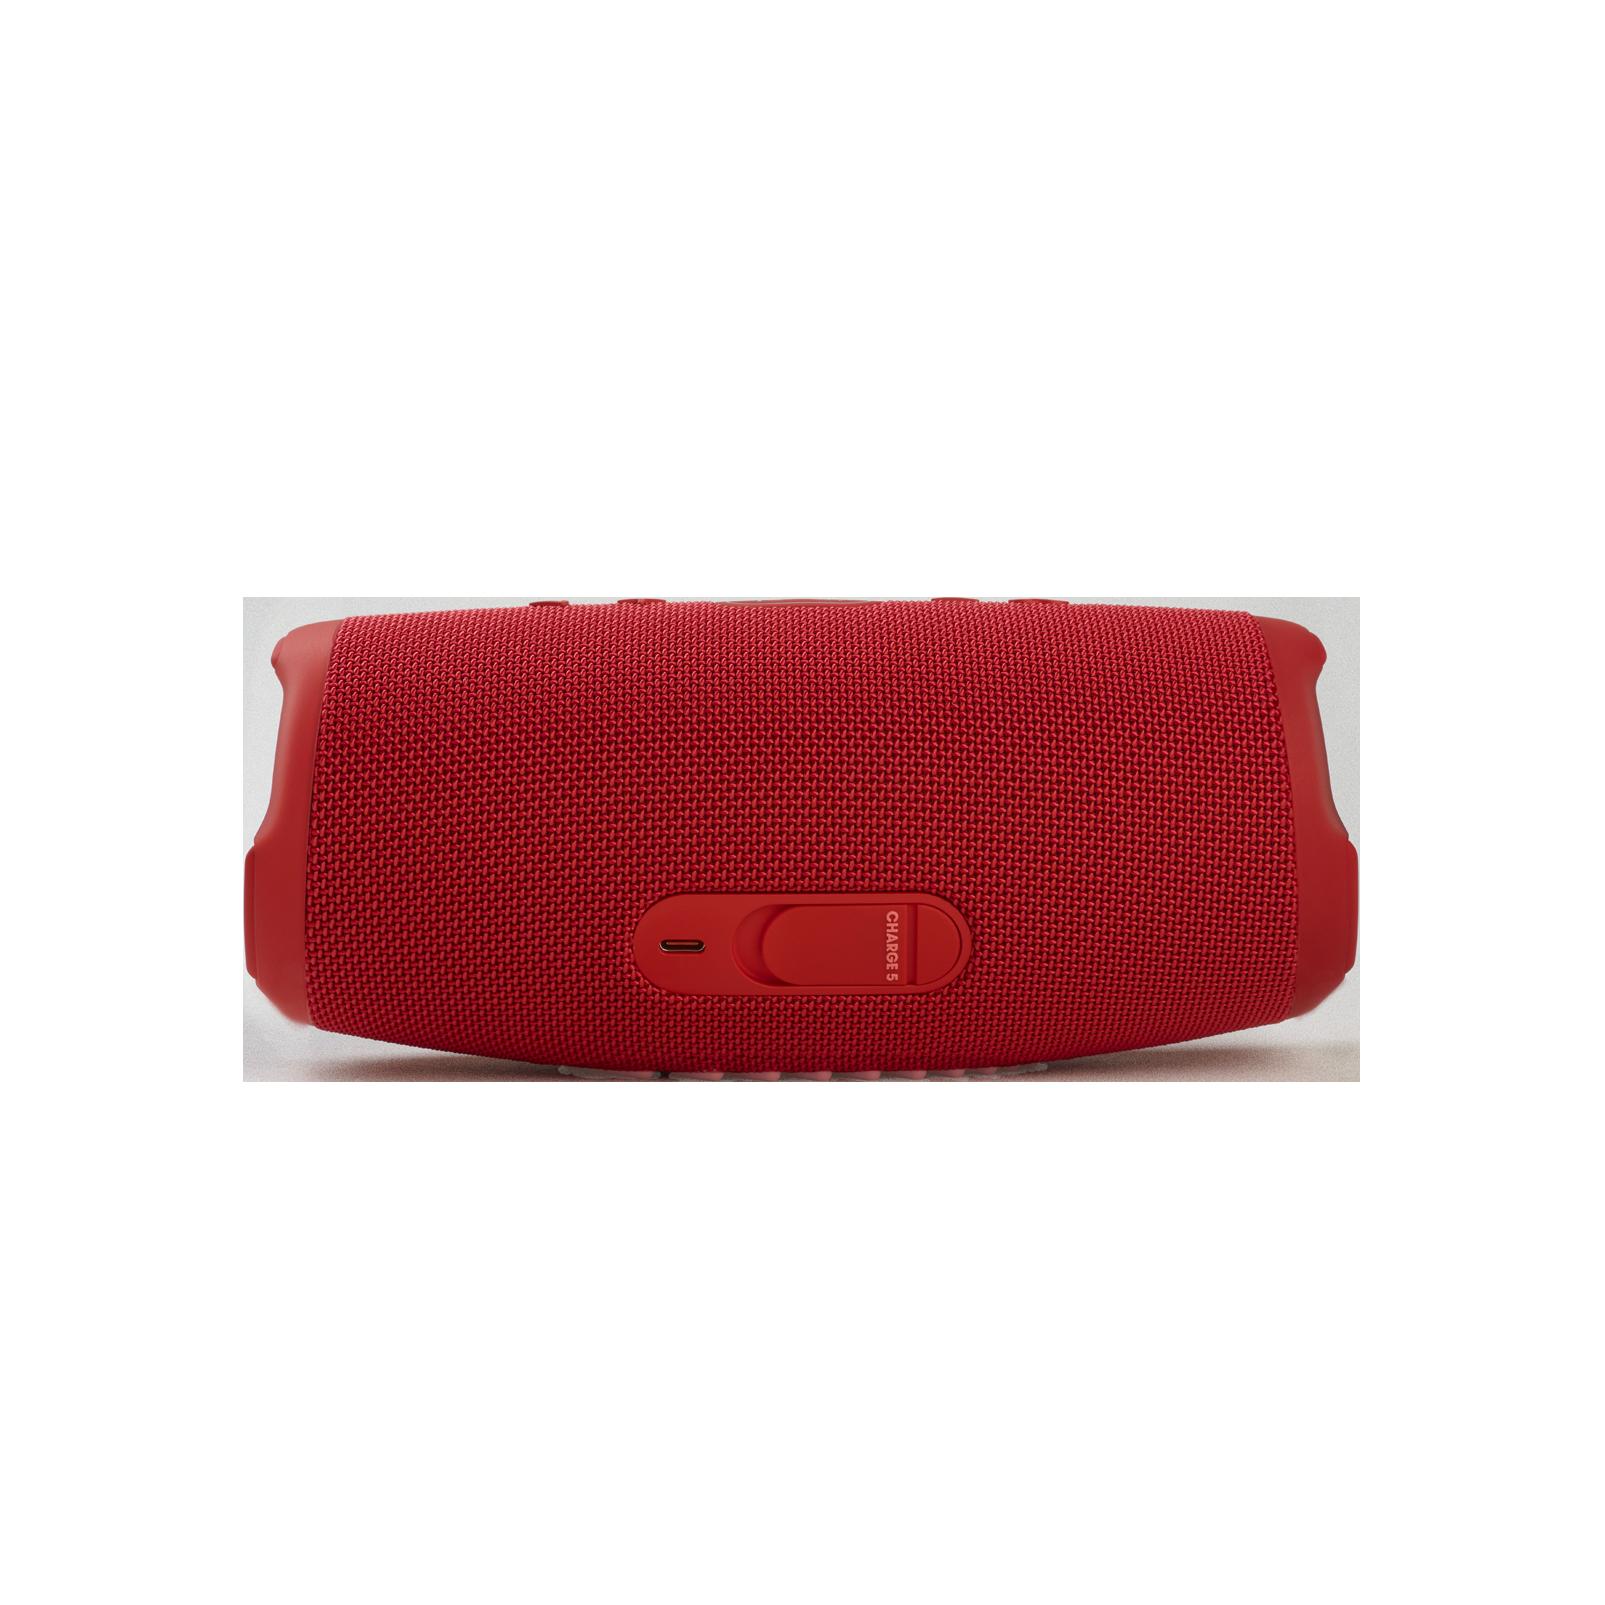 JBL Charge 5 - Red - Portable Waterproof Speaker with Powerbank - Back